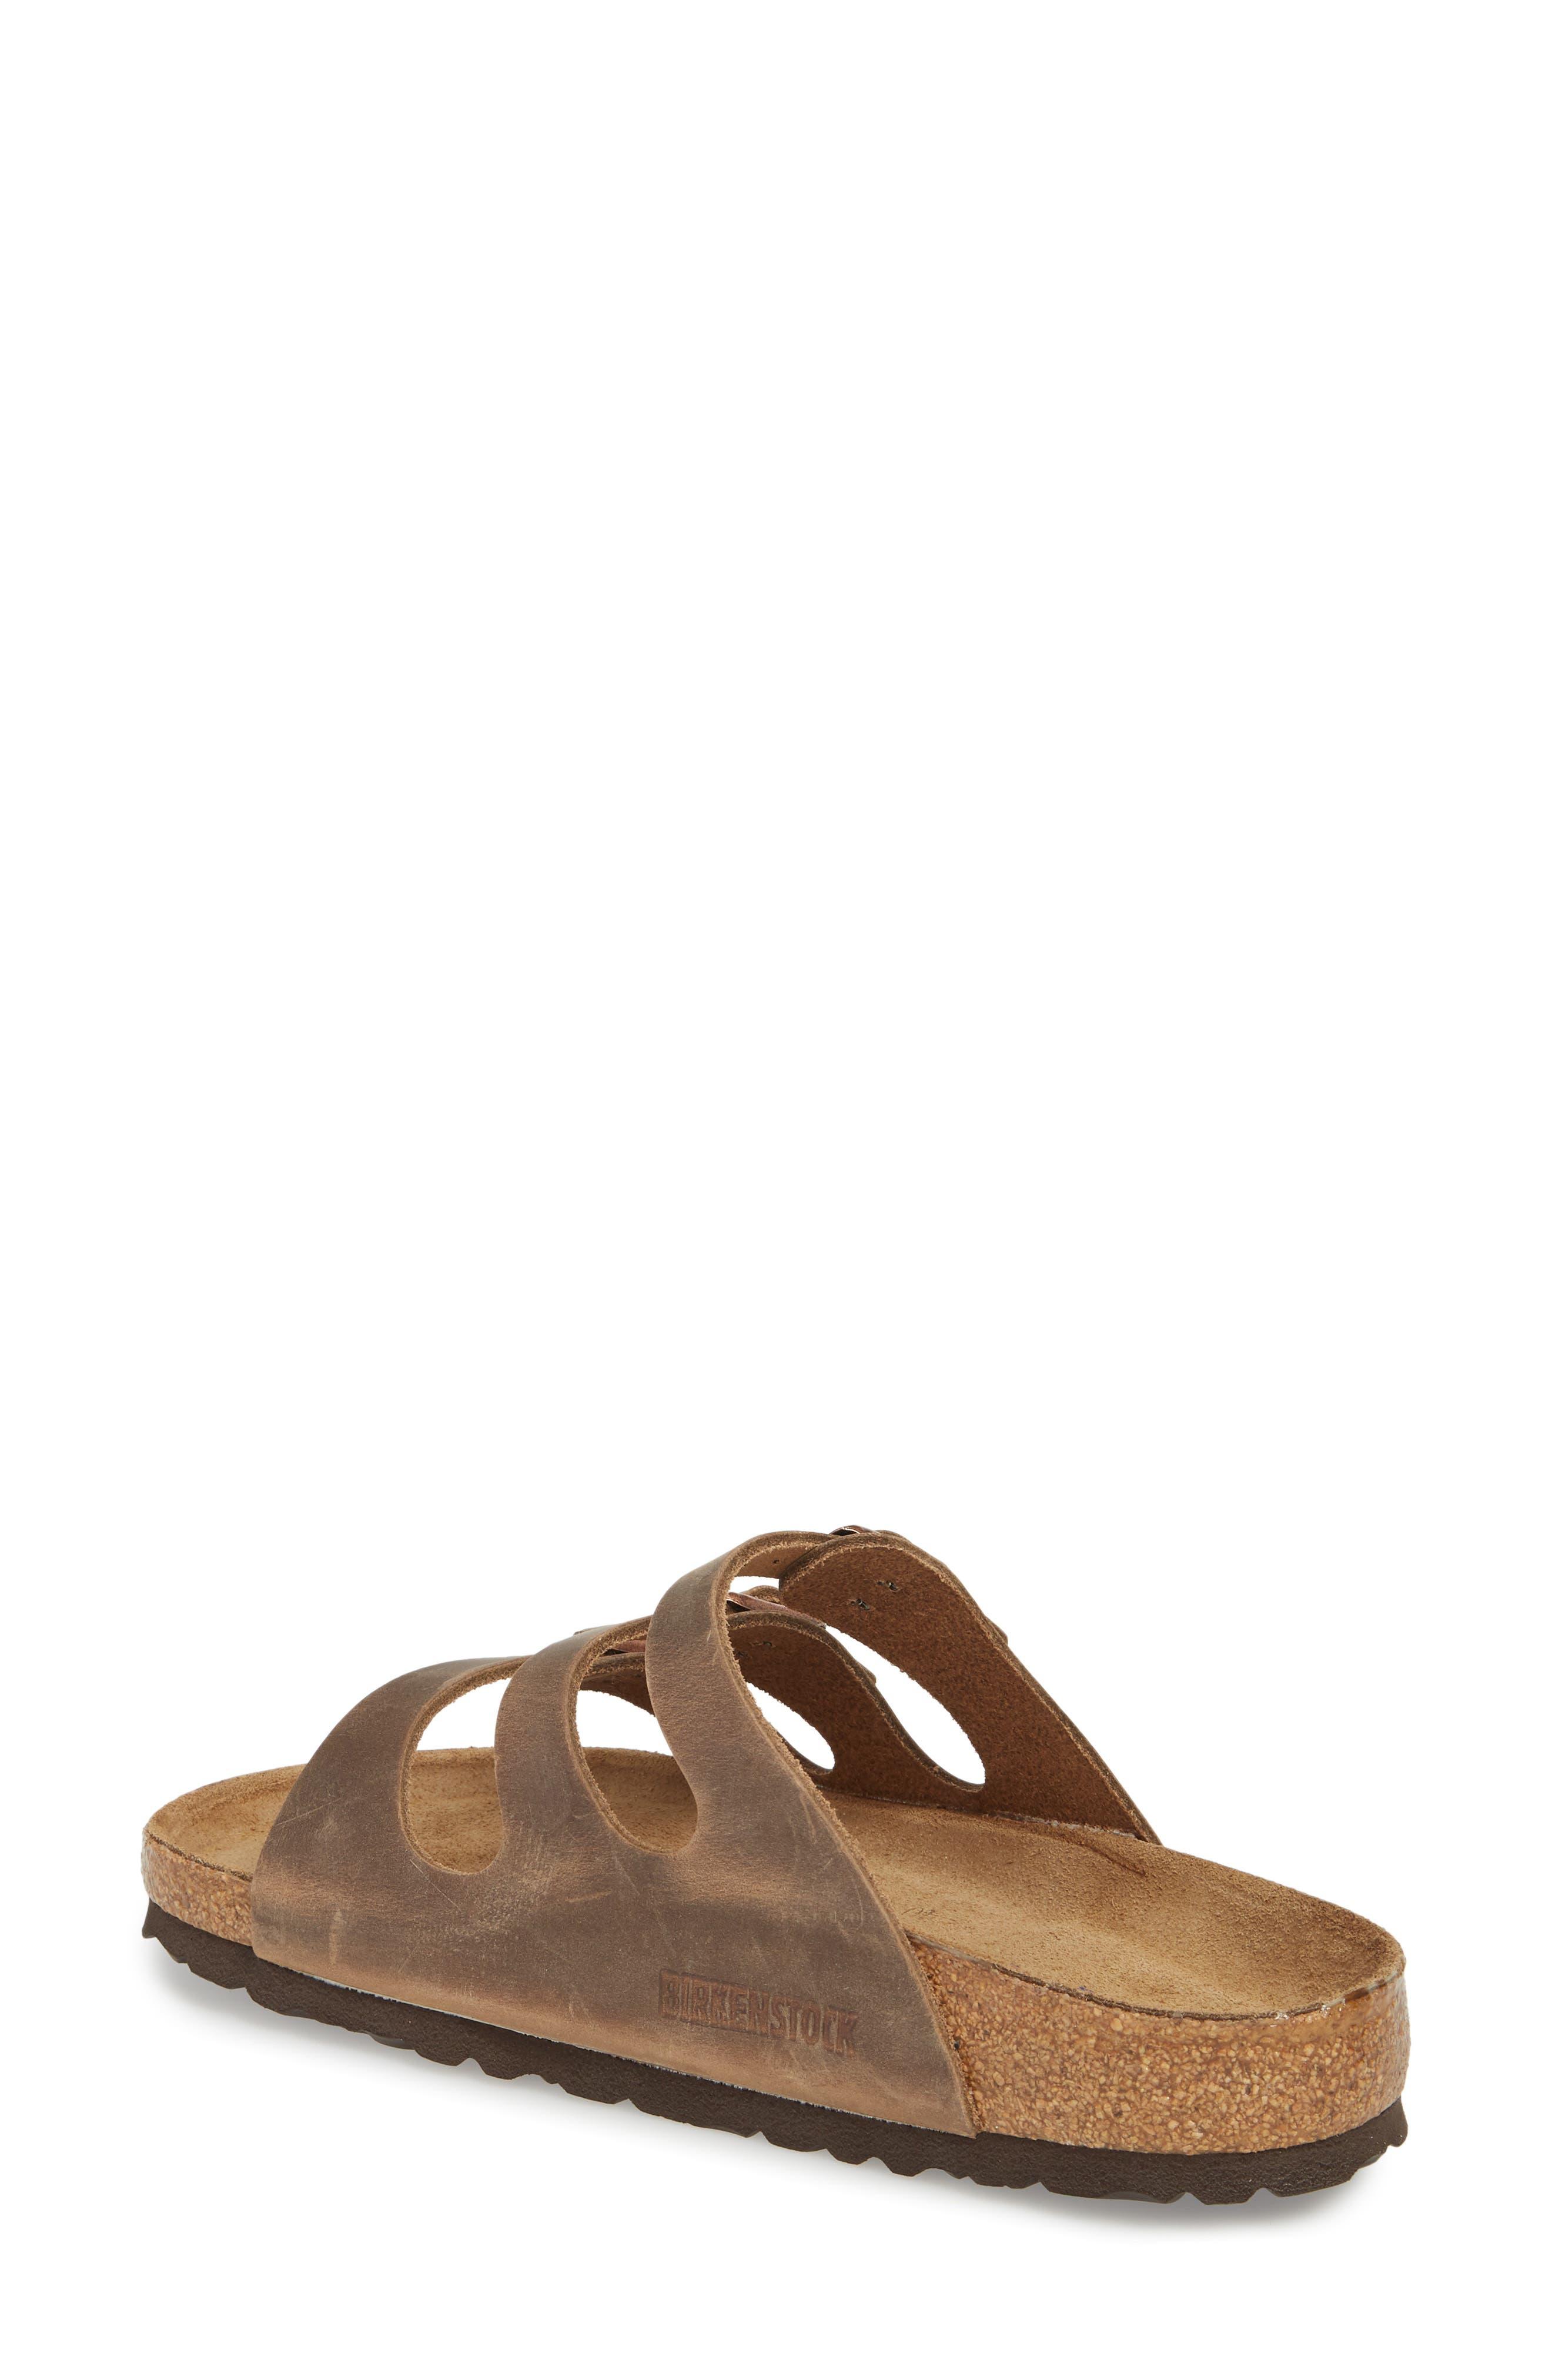 Florida Sandal,                             Alternate thumbnail 2, color,                             Tobacco Oiled Leather